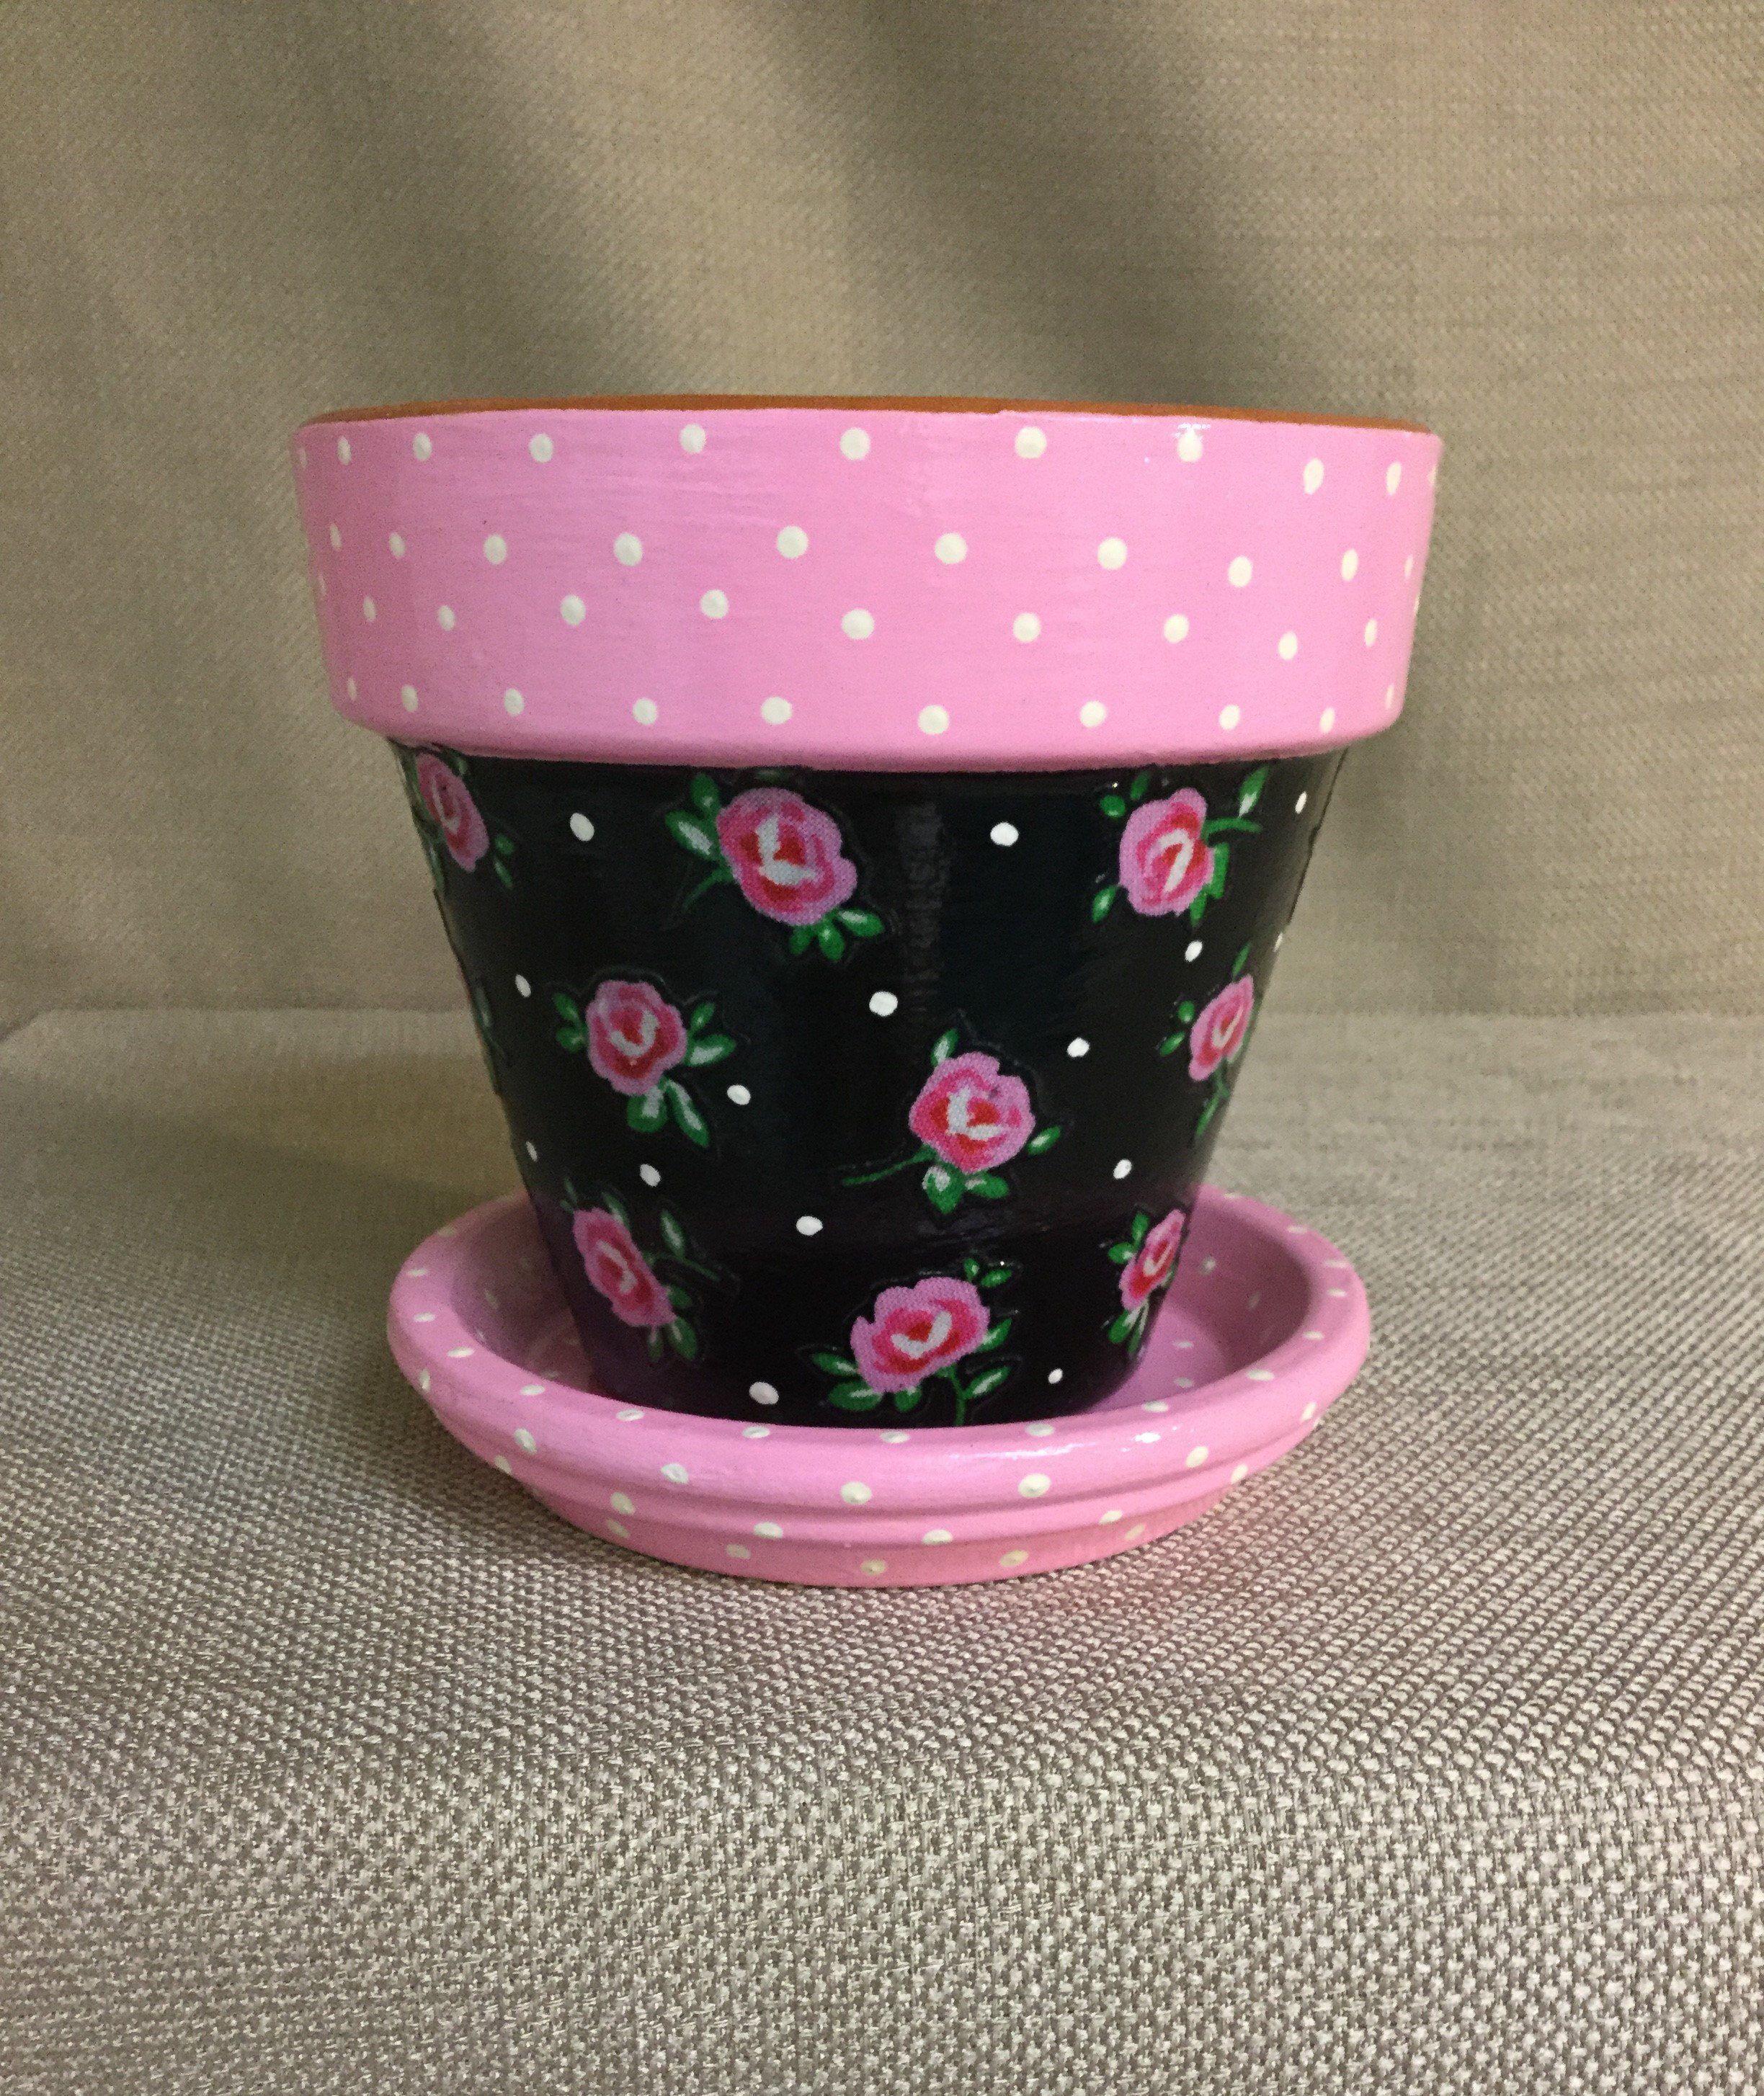 Rose Flower Pot with Saucer, Irish Rose Planter, Pink and